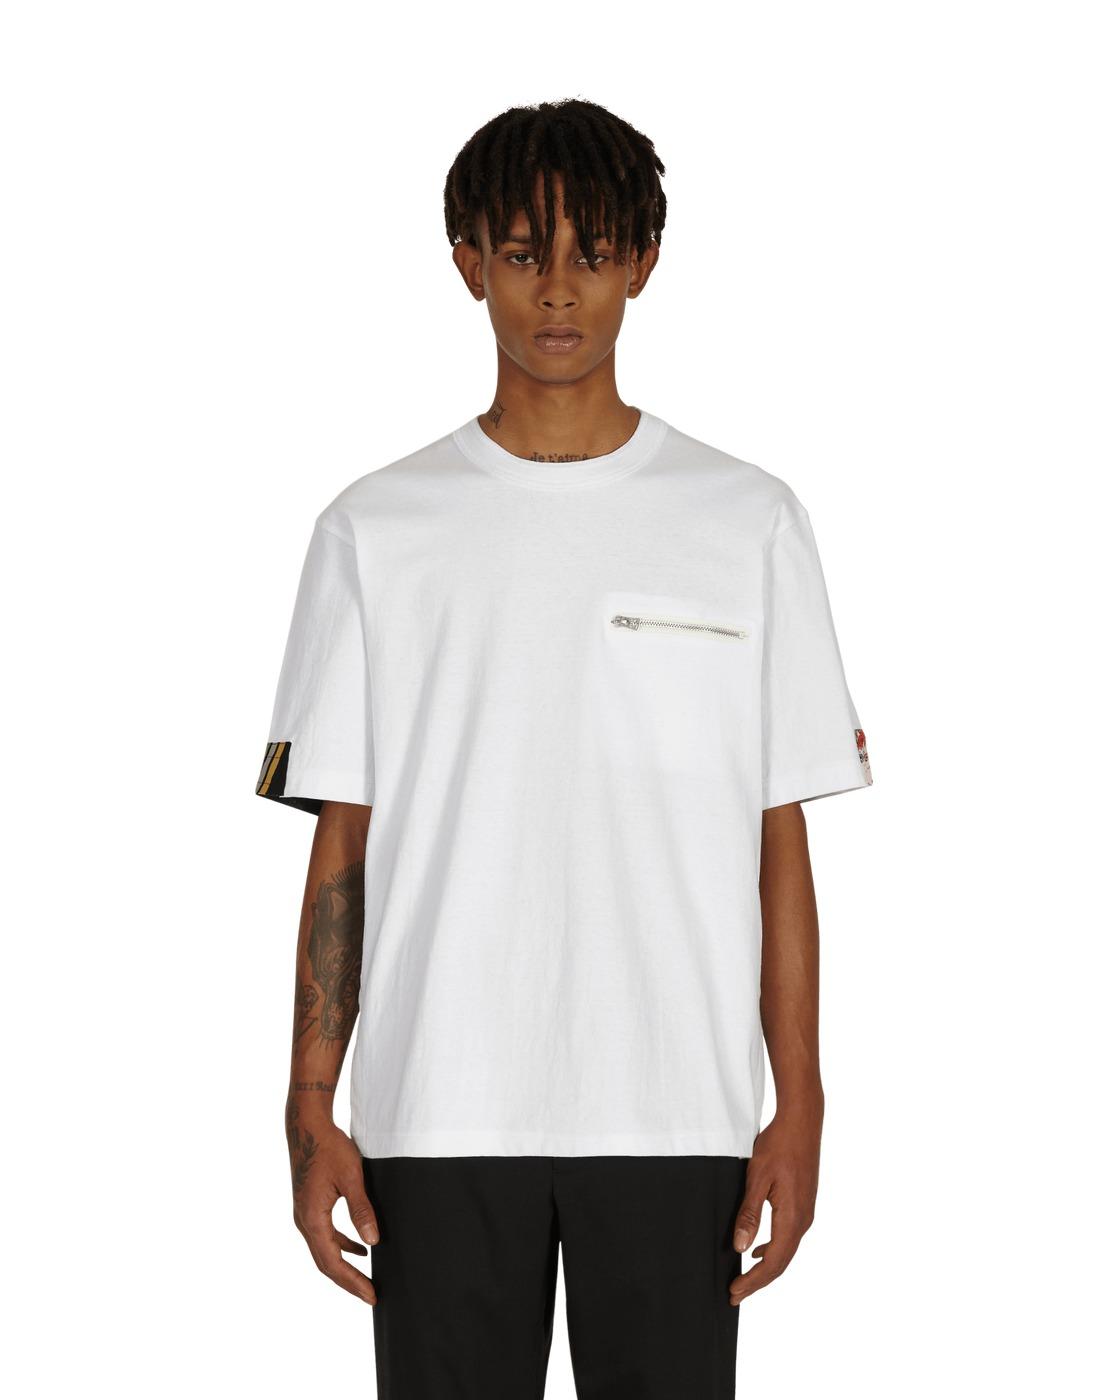 Sacai Archive Print Mix T Shirt White